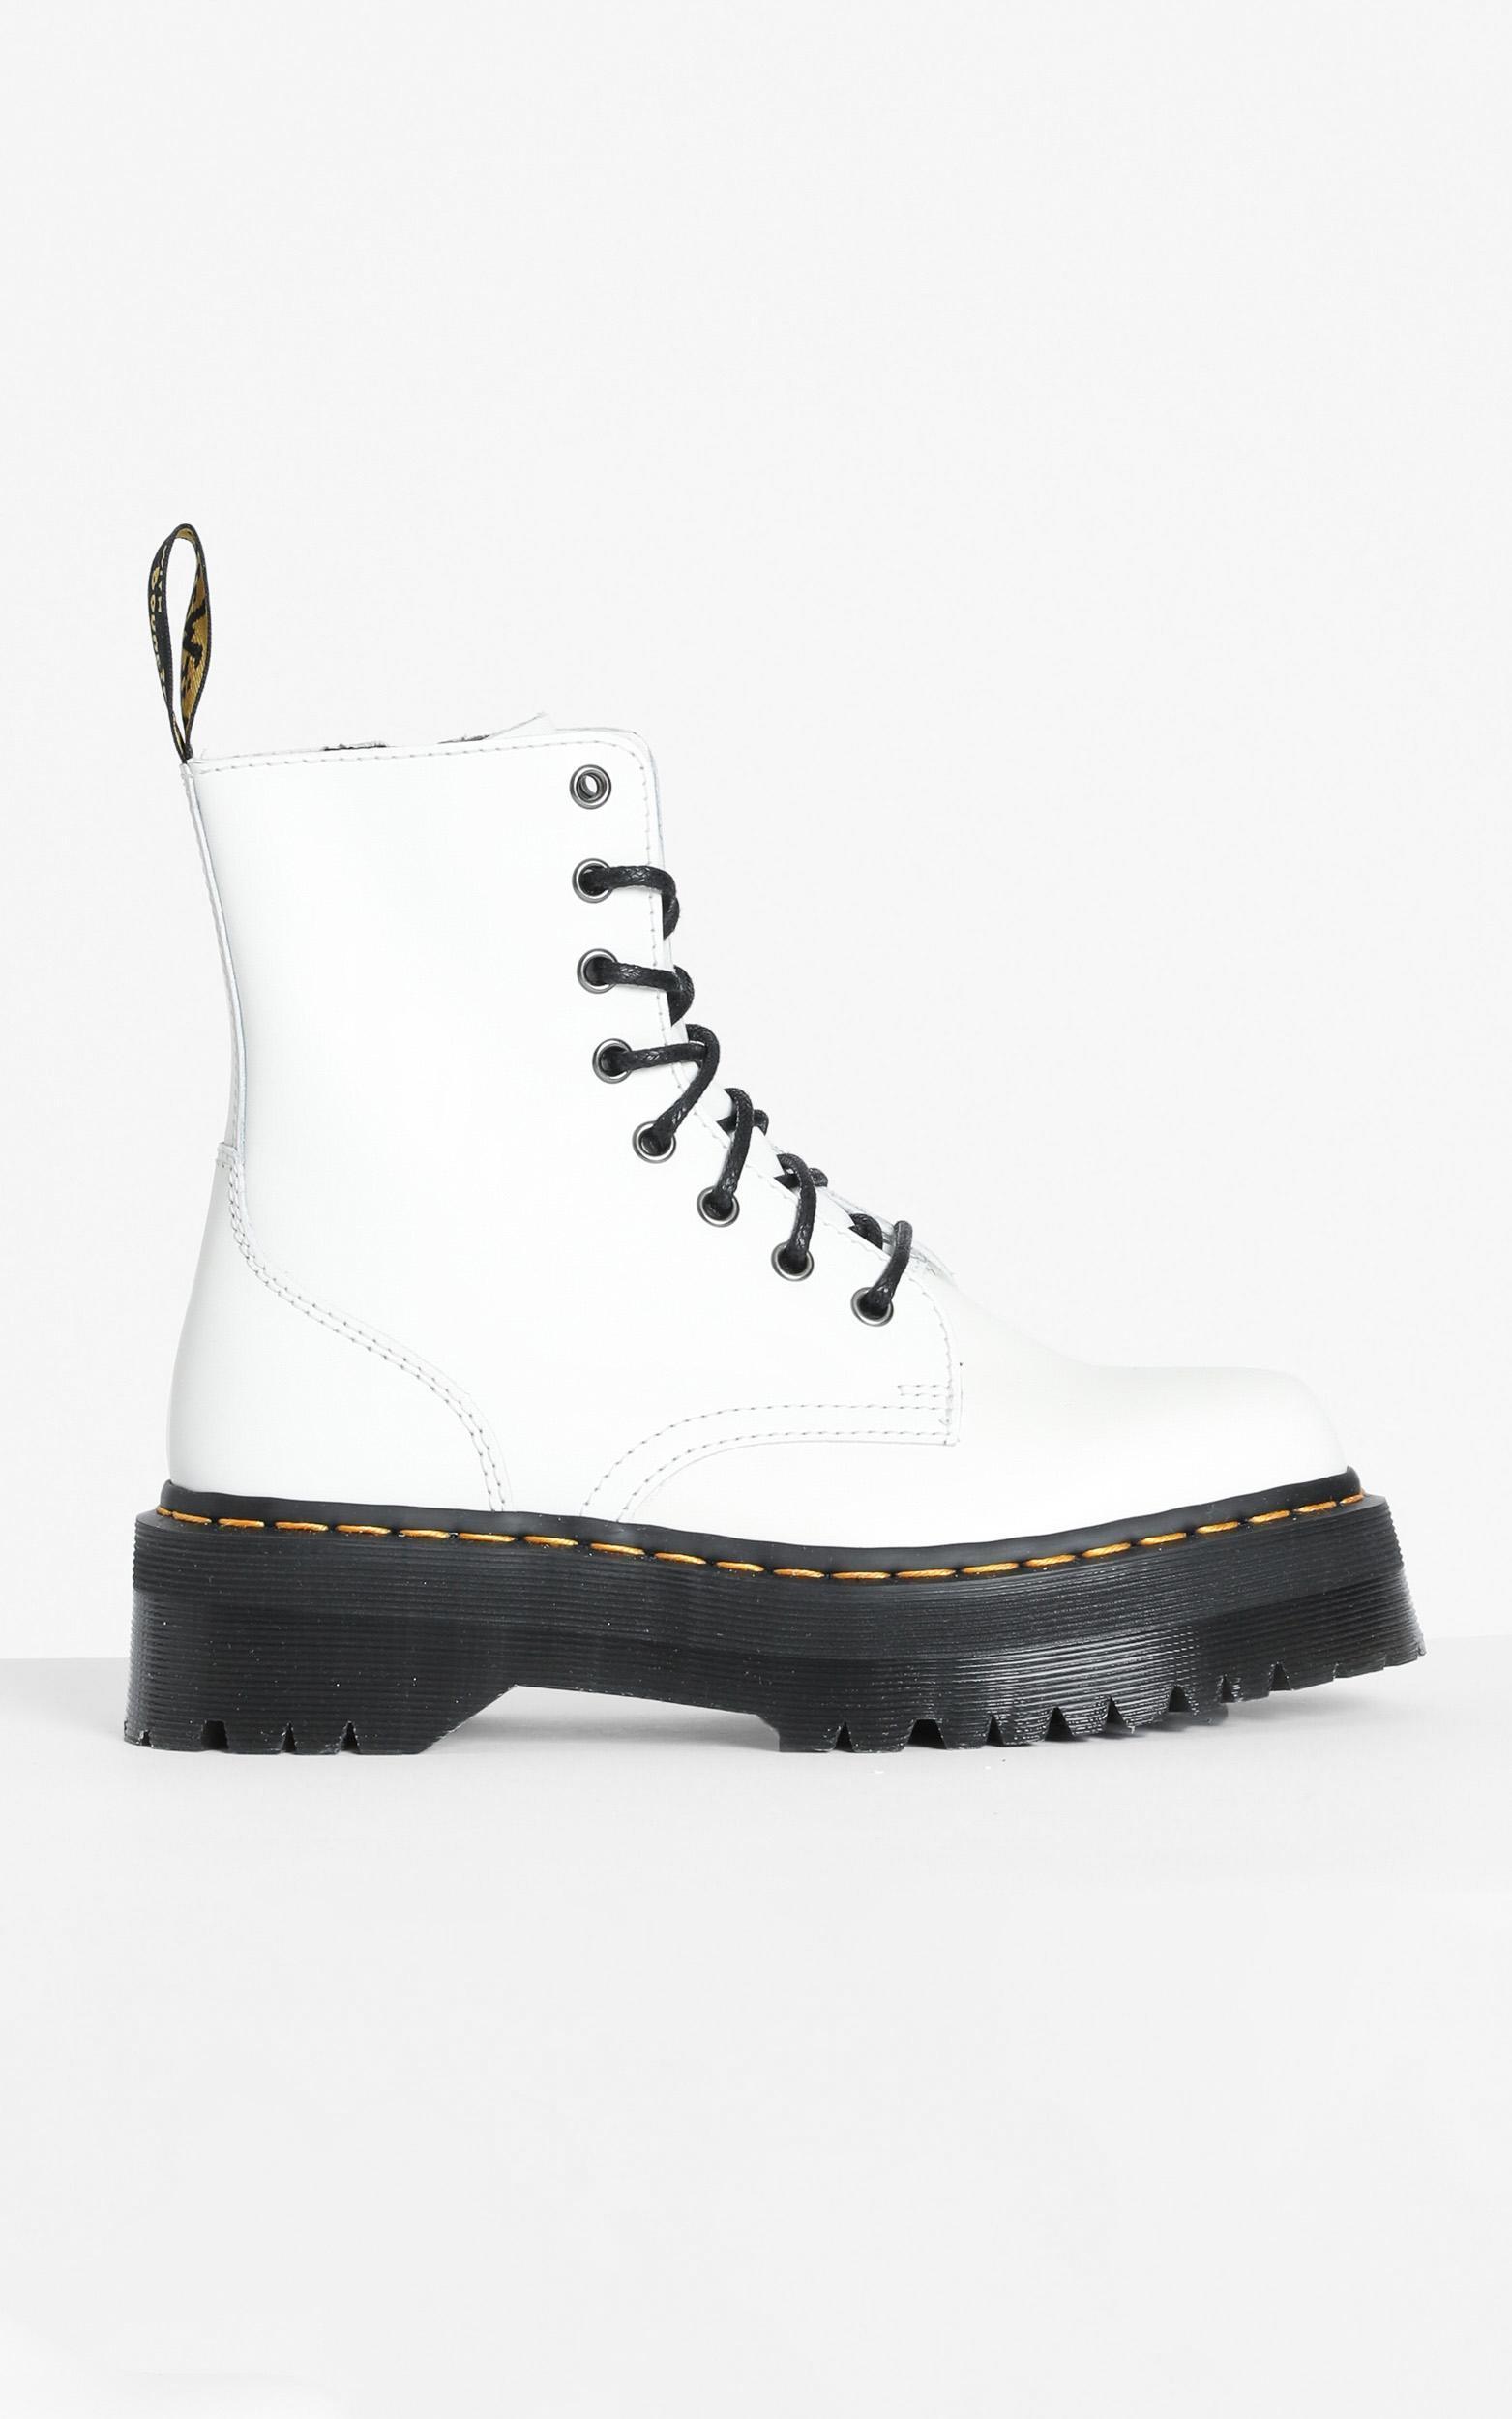 Dr. Martens - Jadon 8 Eye Boot in White - 5, White, hi-res image number null